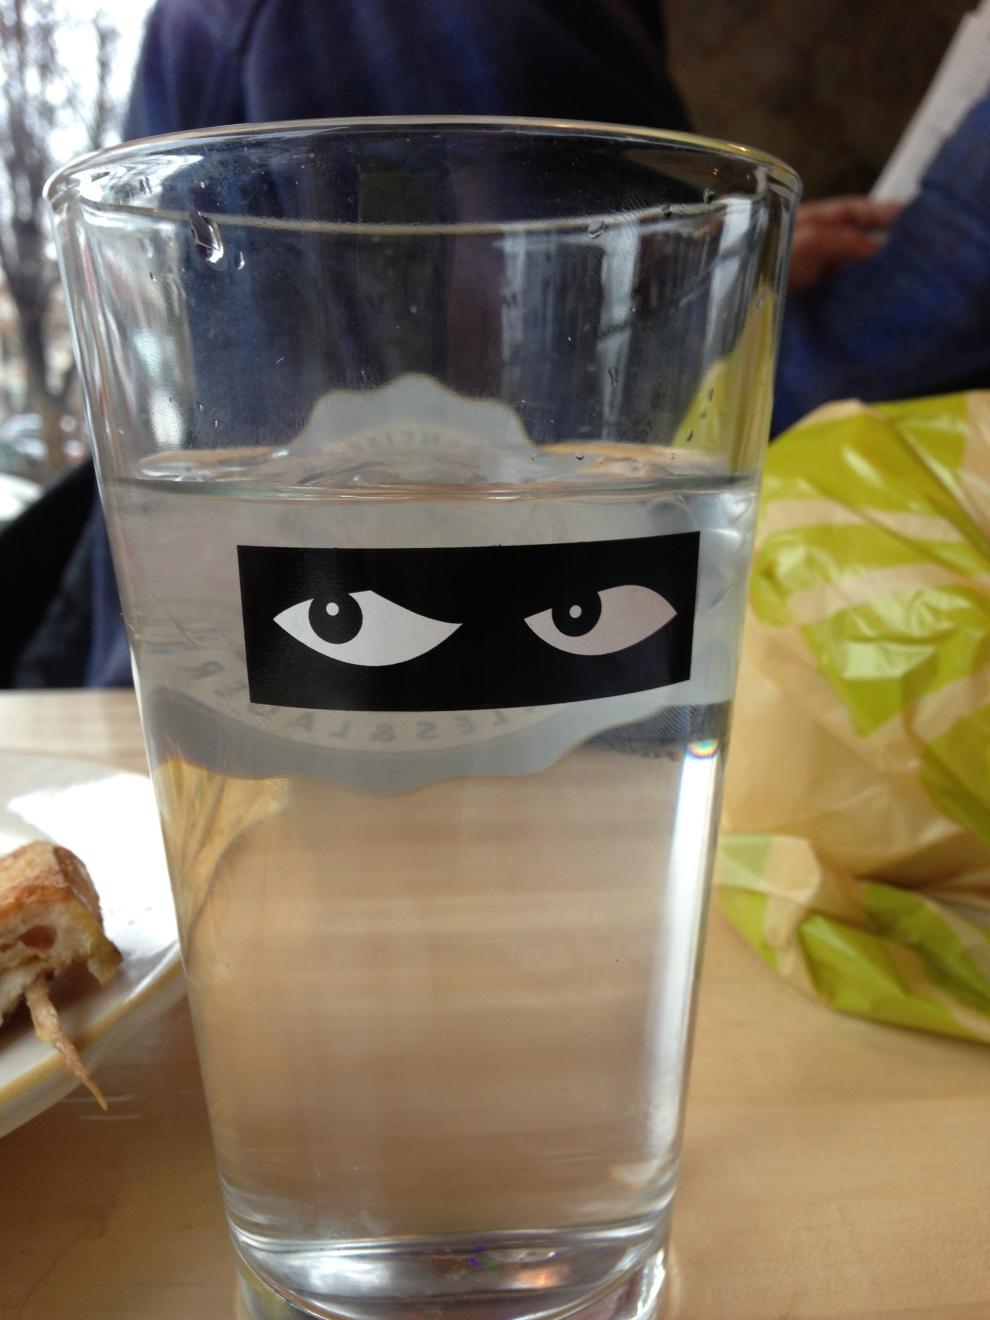 eyes on glass